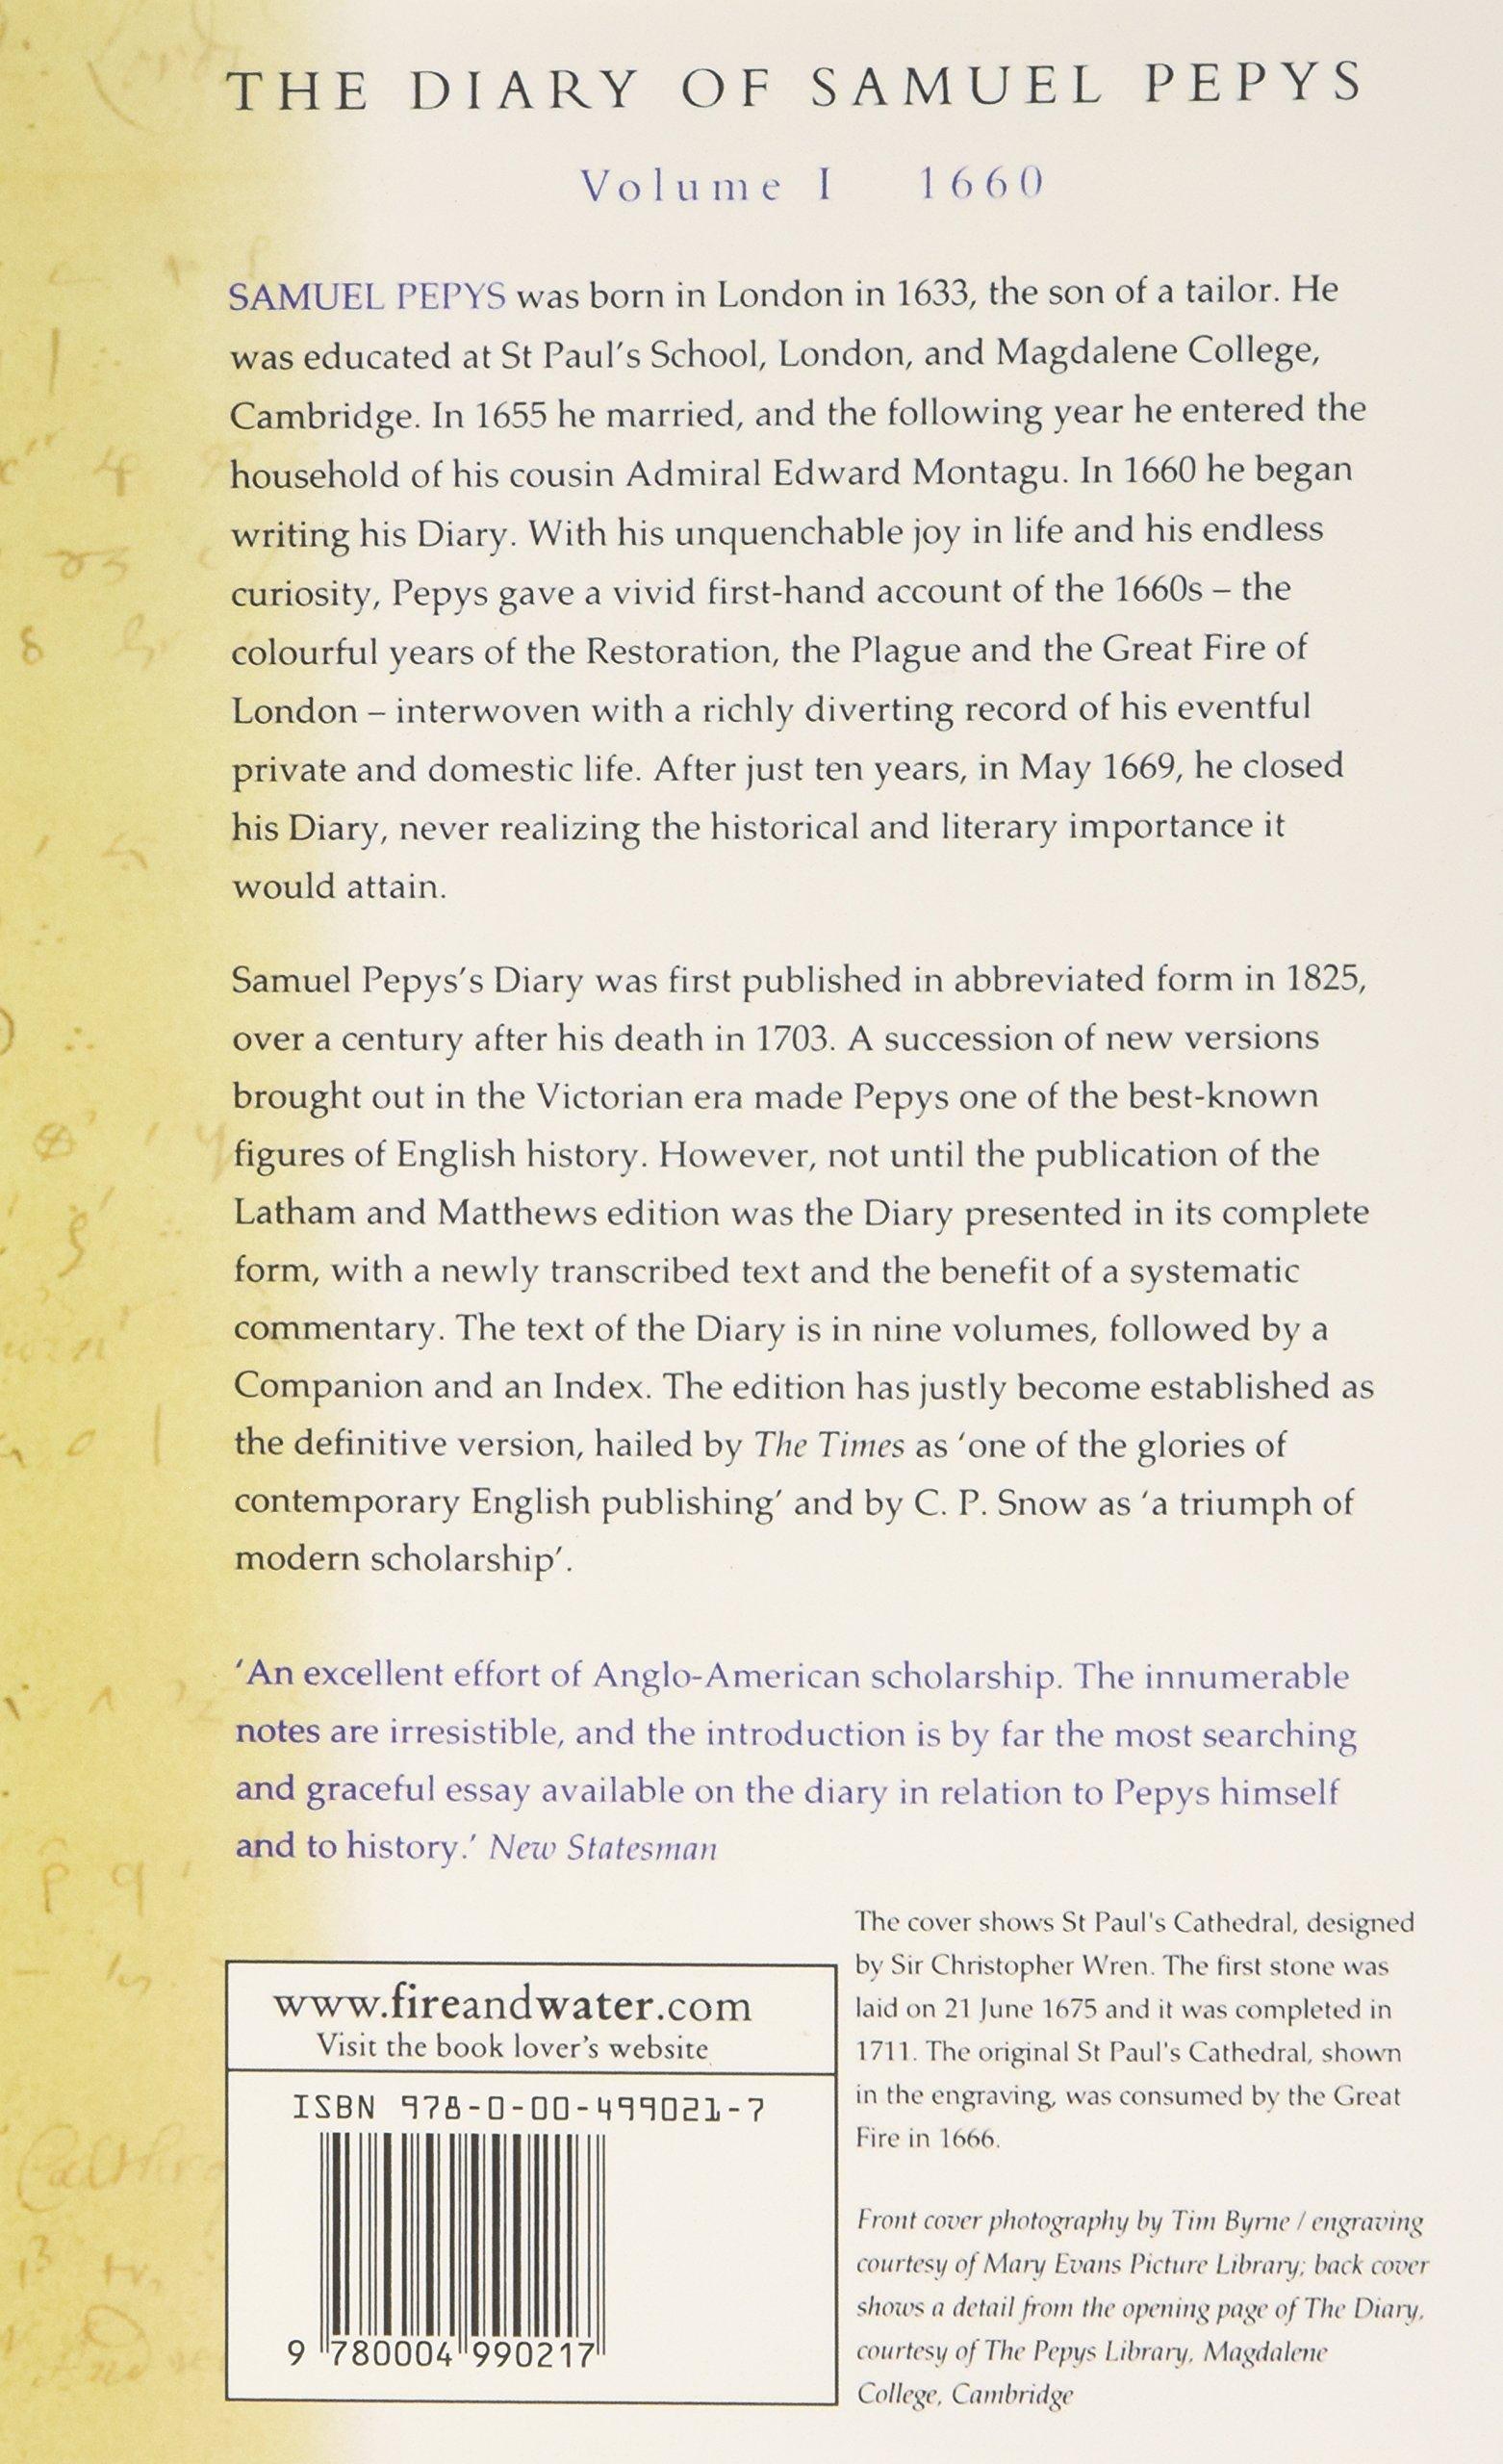 the diary of samuel pepys volume i v amazon co the diary of samuel pepys volume i 1660 1660 v 1 amazon co uk samuel pepys 9780004990217 books